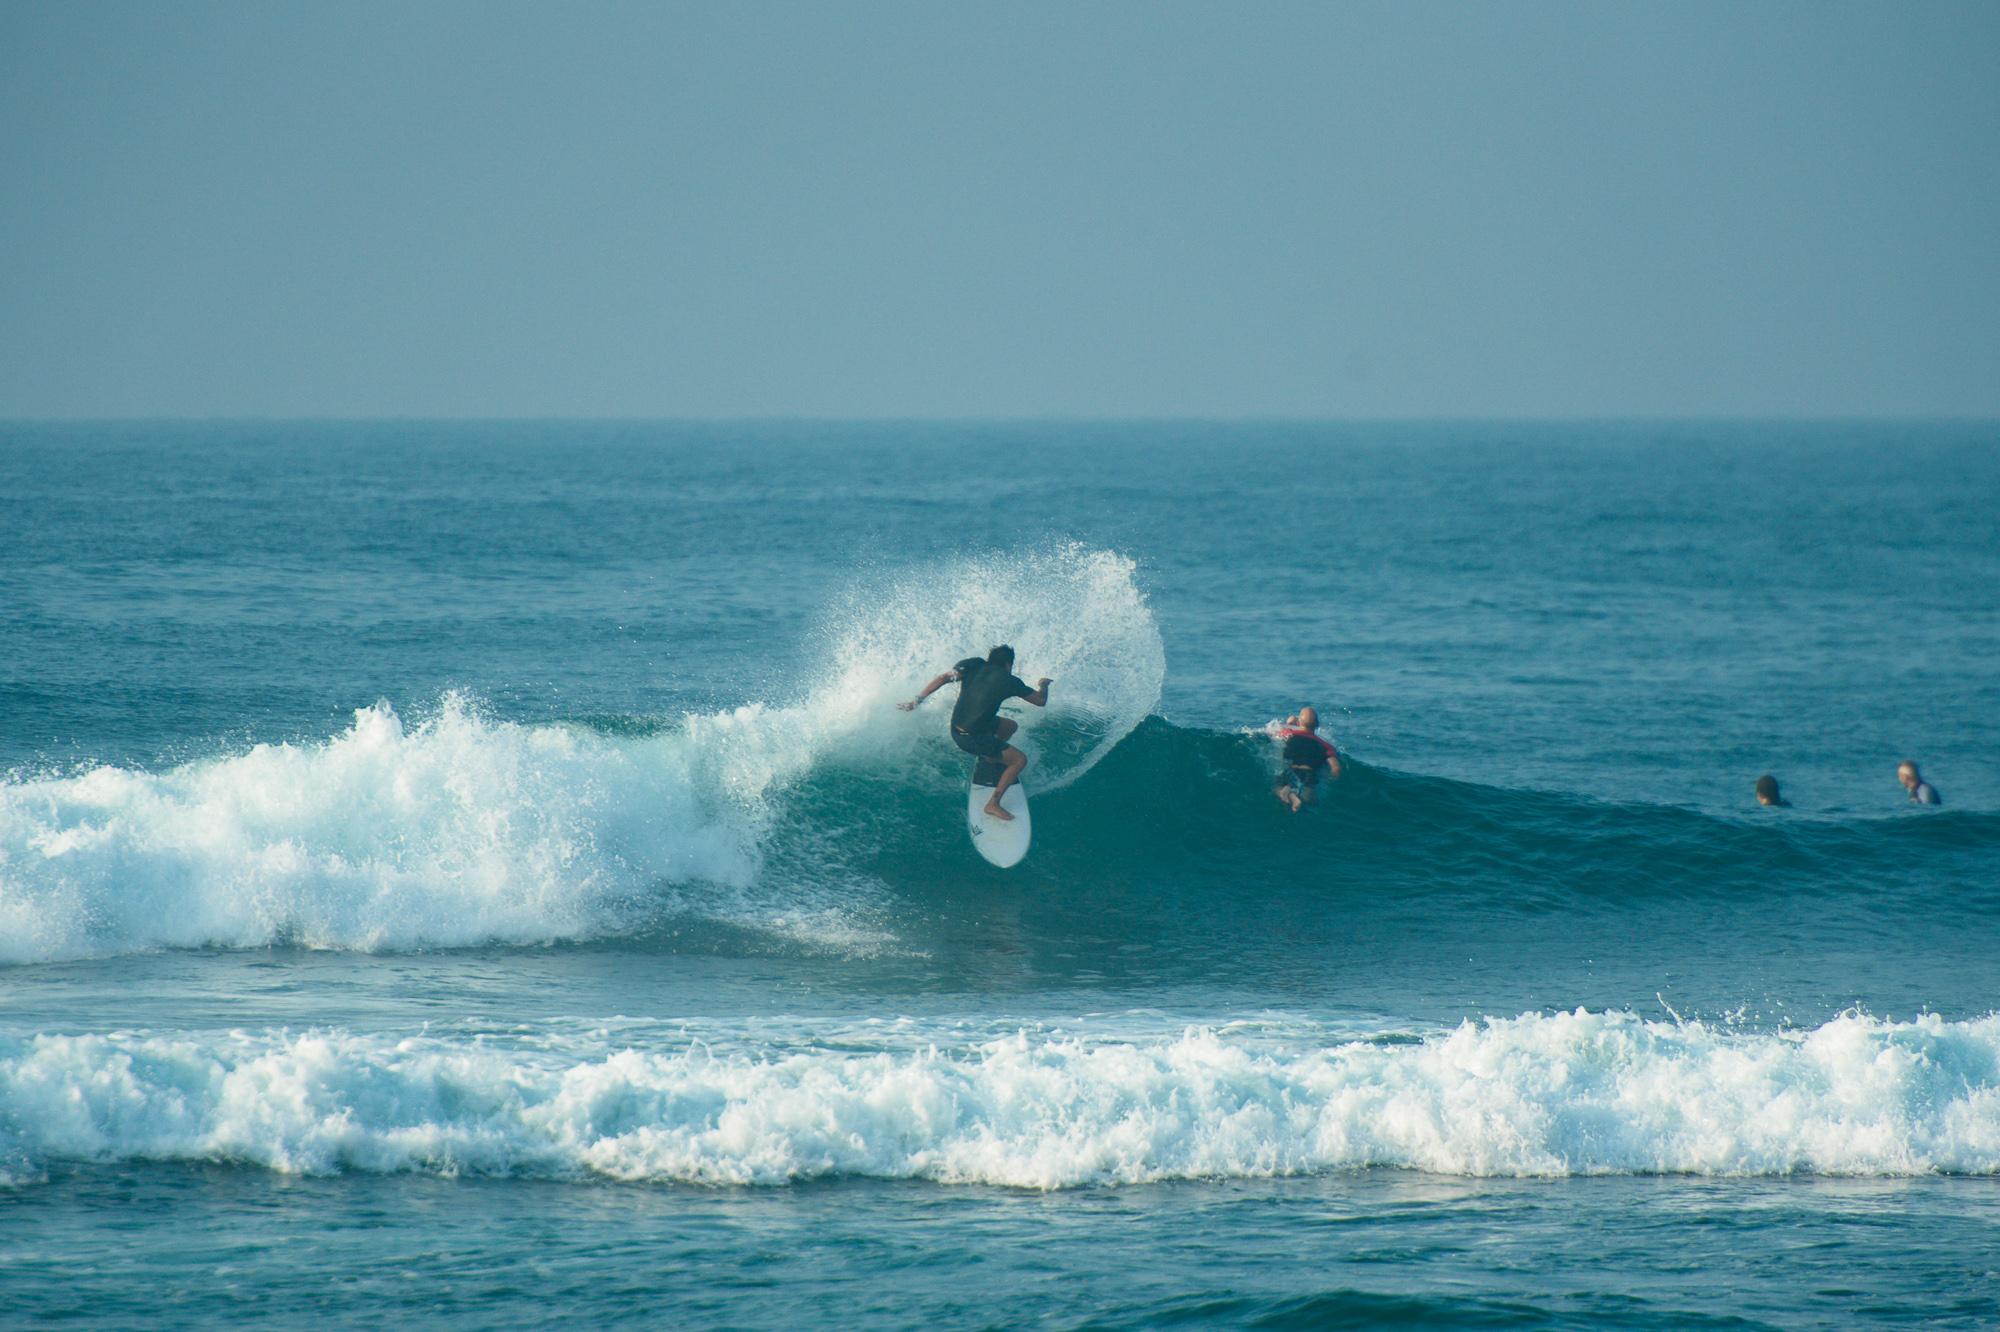 Нам важен ваш прогресс в серфинге и SUP